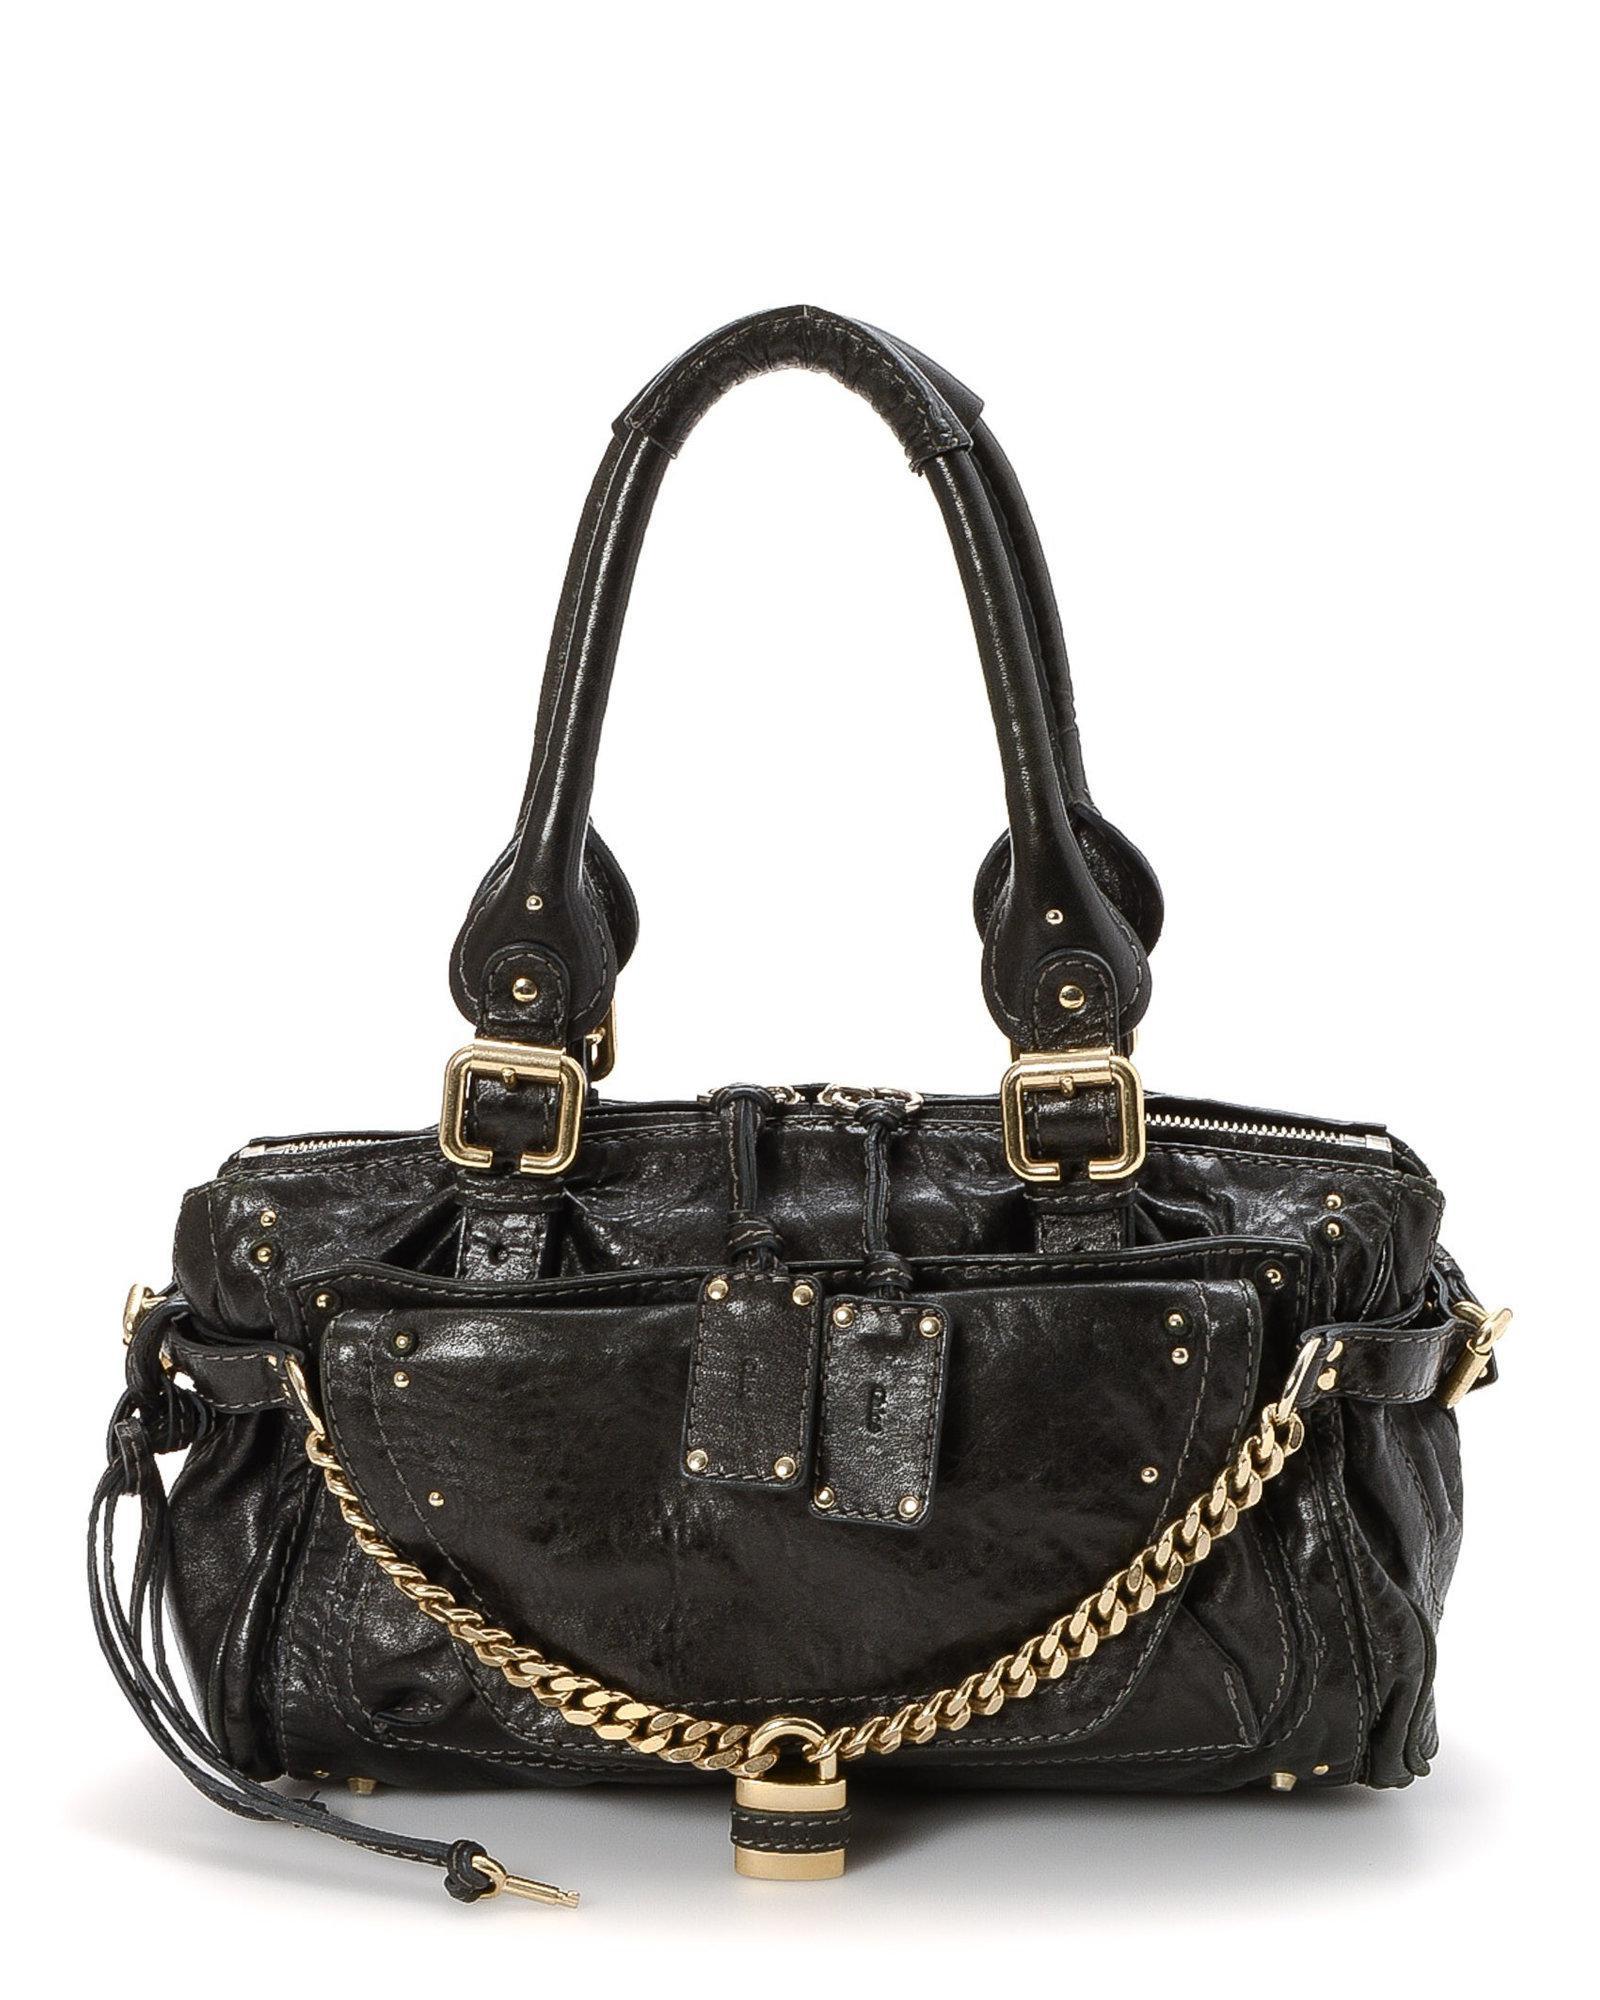 846cfe7d922a Lyst - Chloé Handbag - Vintage in Black